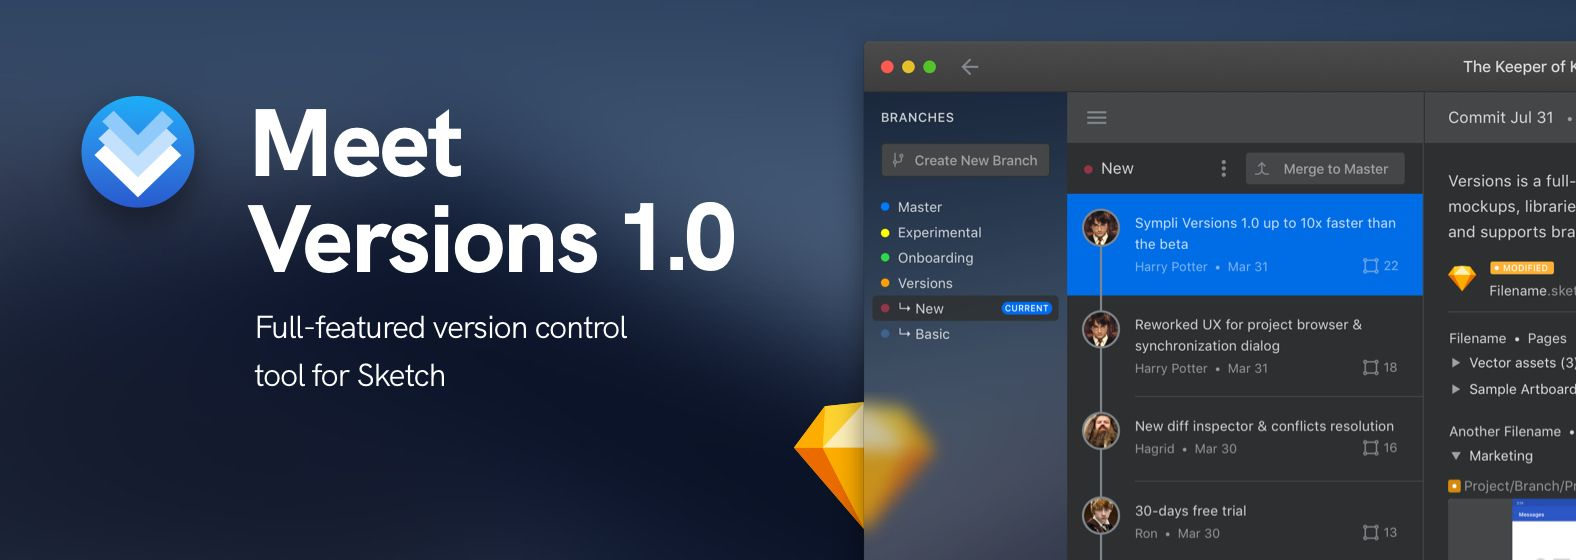 Meet Versions 1.0